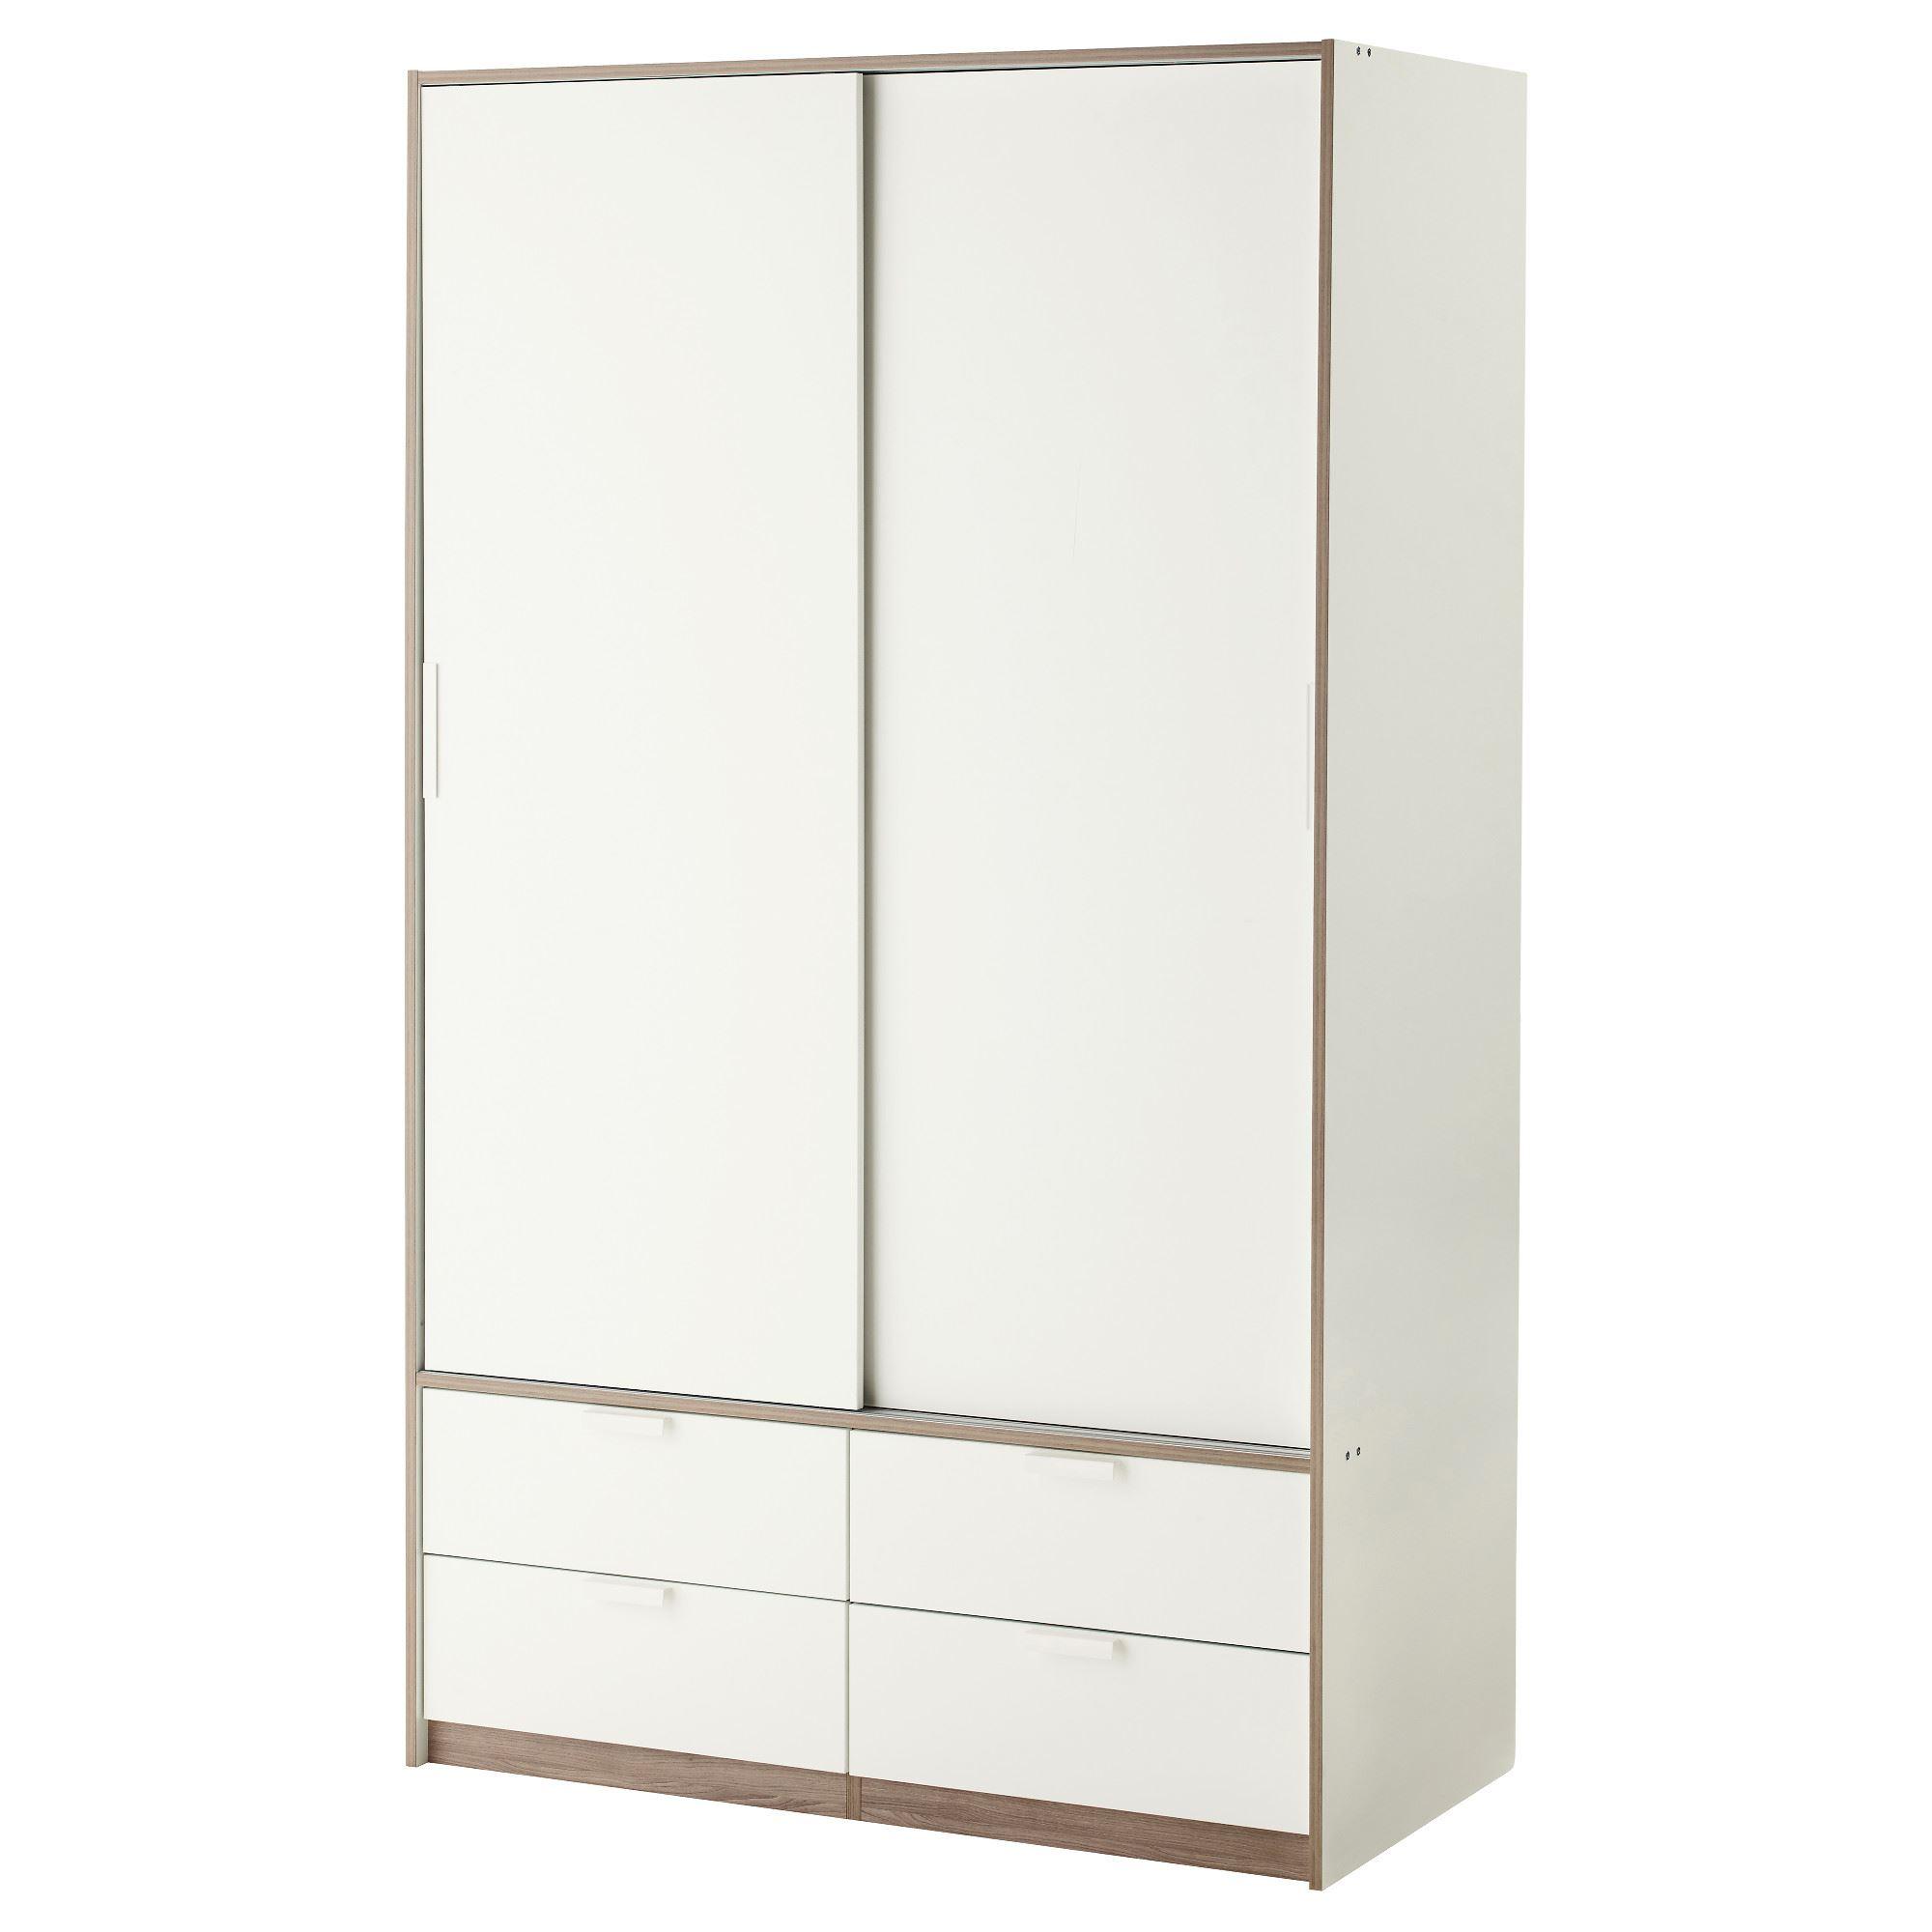 Trysil Sliding Door Wardrobe White 118x61x202 Cm Ikea Ikea For